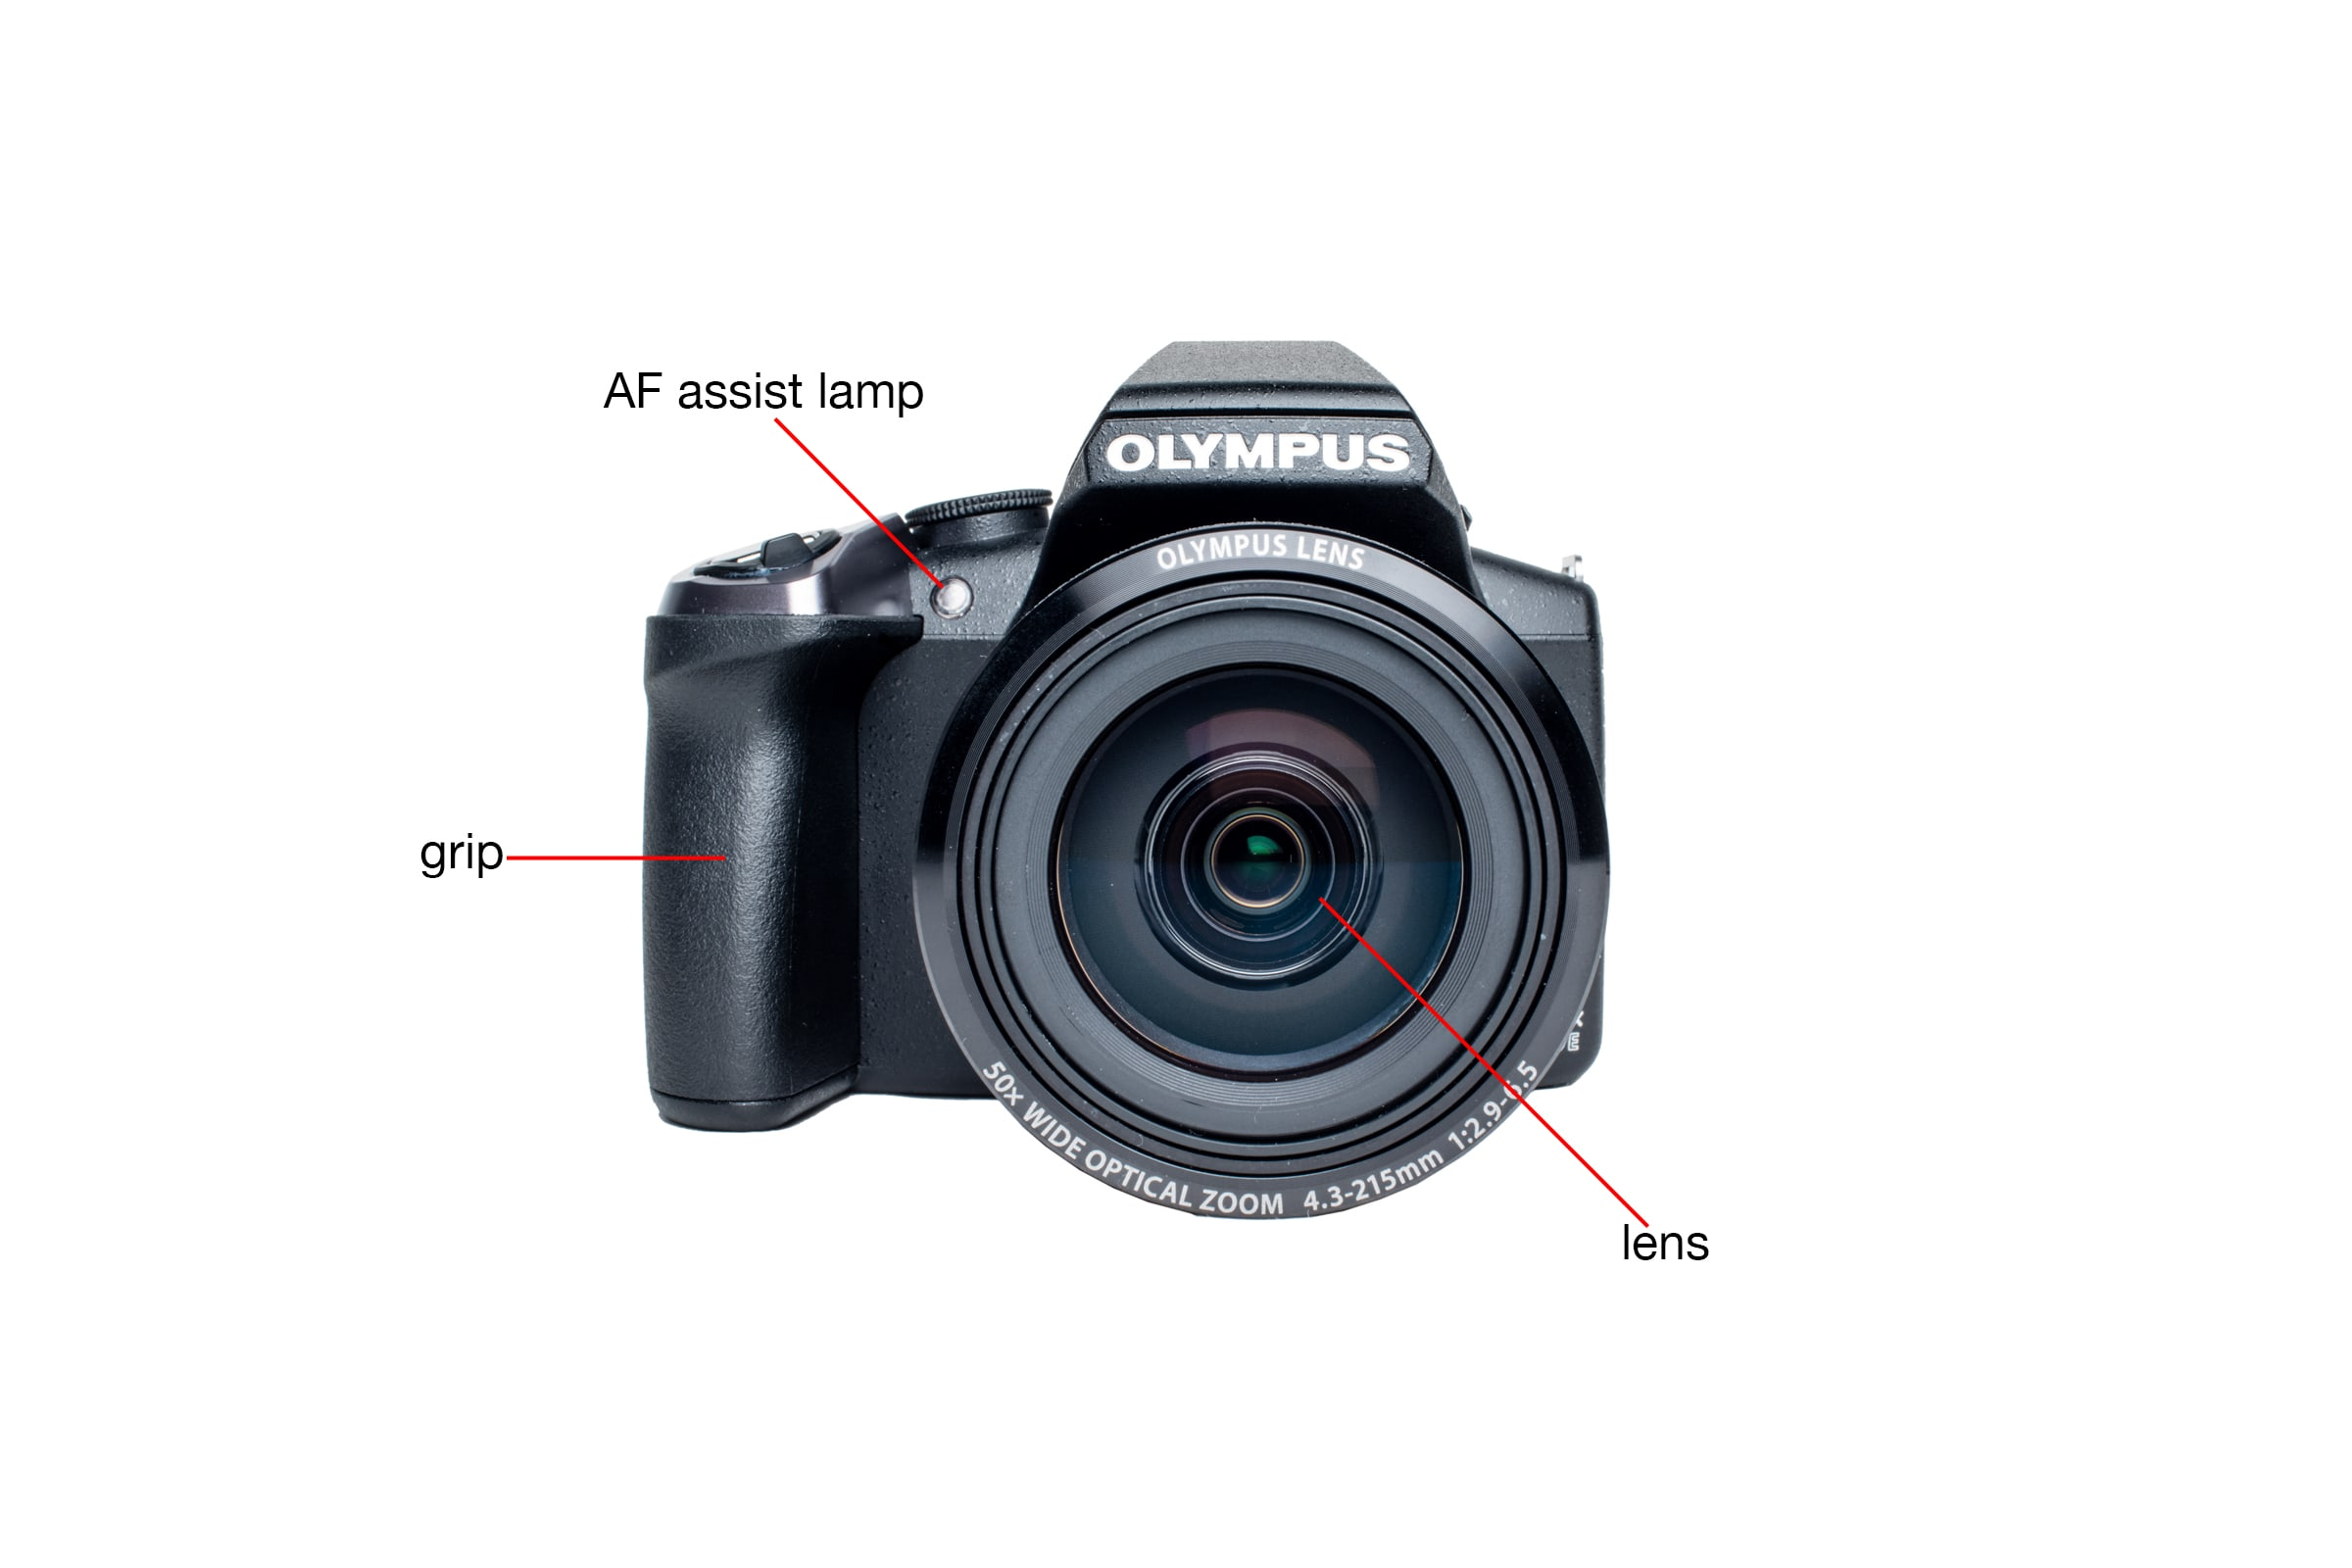 Olympus Stylus SP-100EE Digital Camera Review - Reviewed.com Cameras